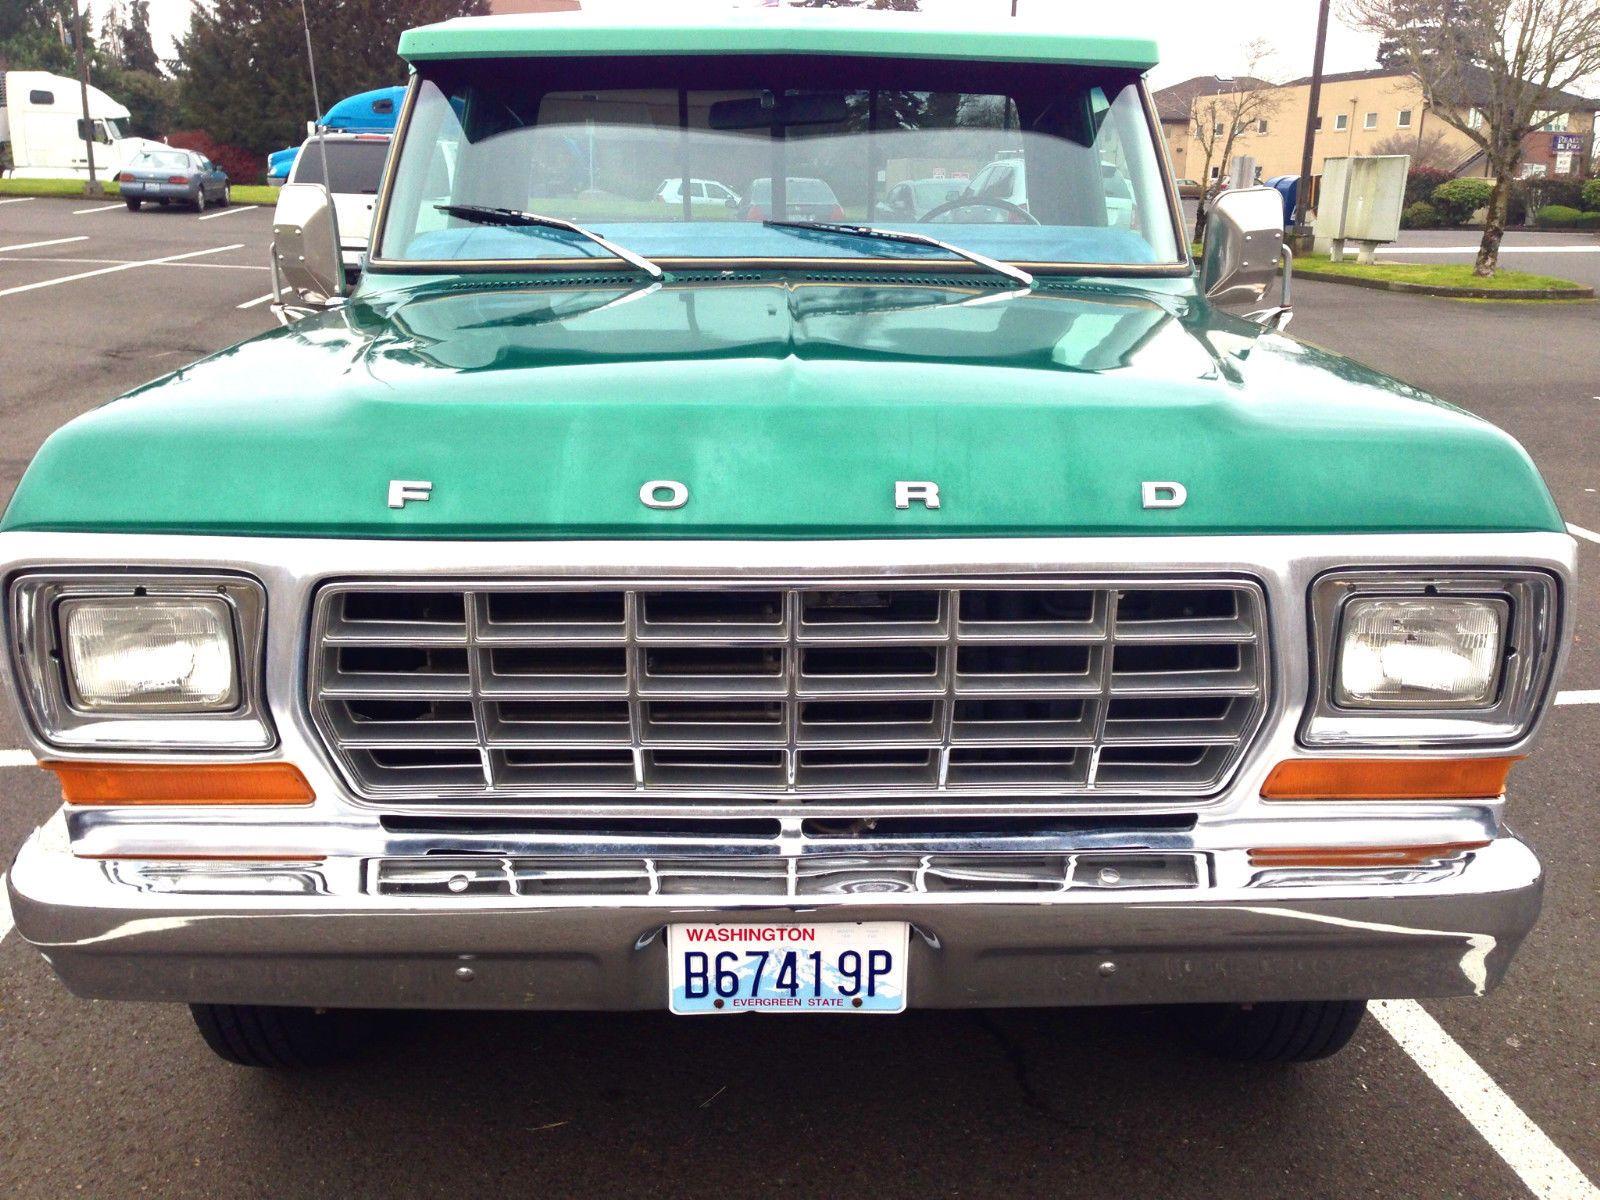 medium resolution of 1978 ford f 350 xlt ranger camper special 2wd automatic transmission 460cu v8